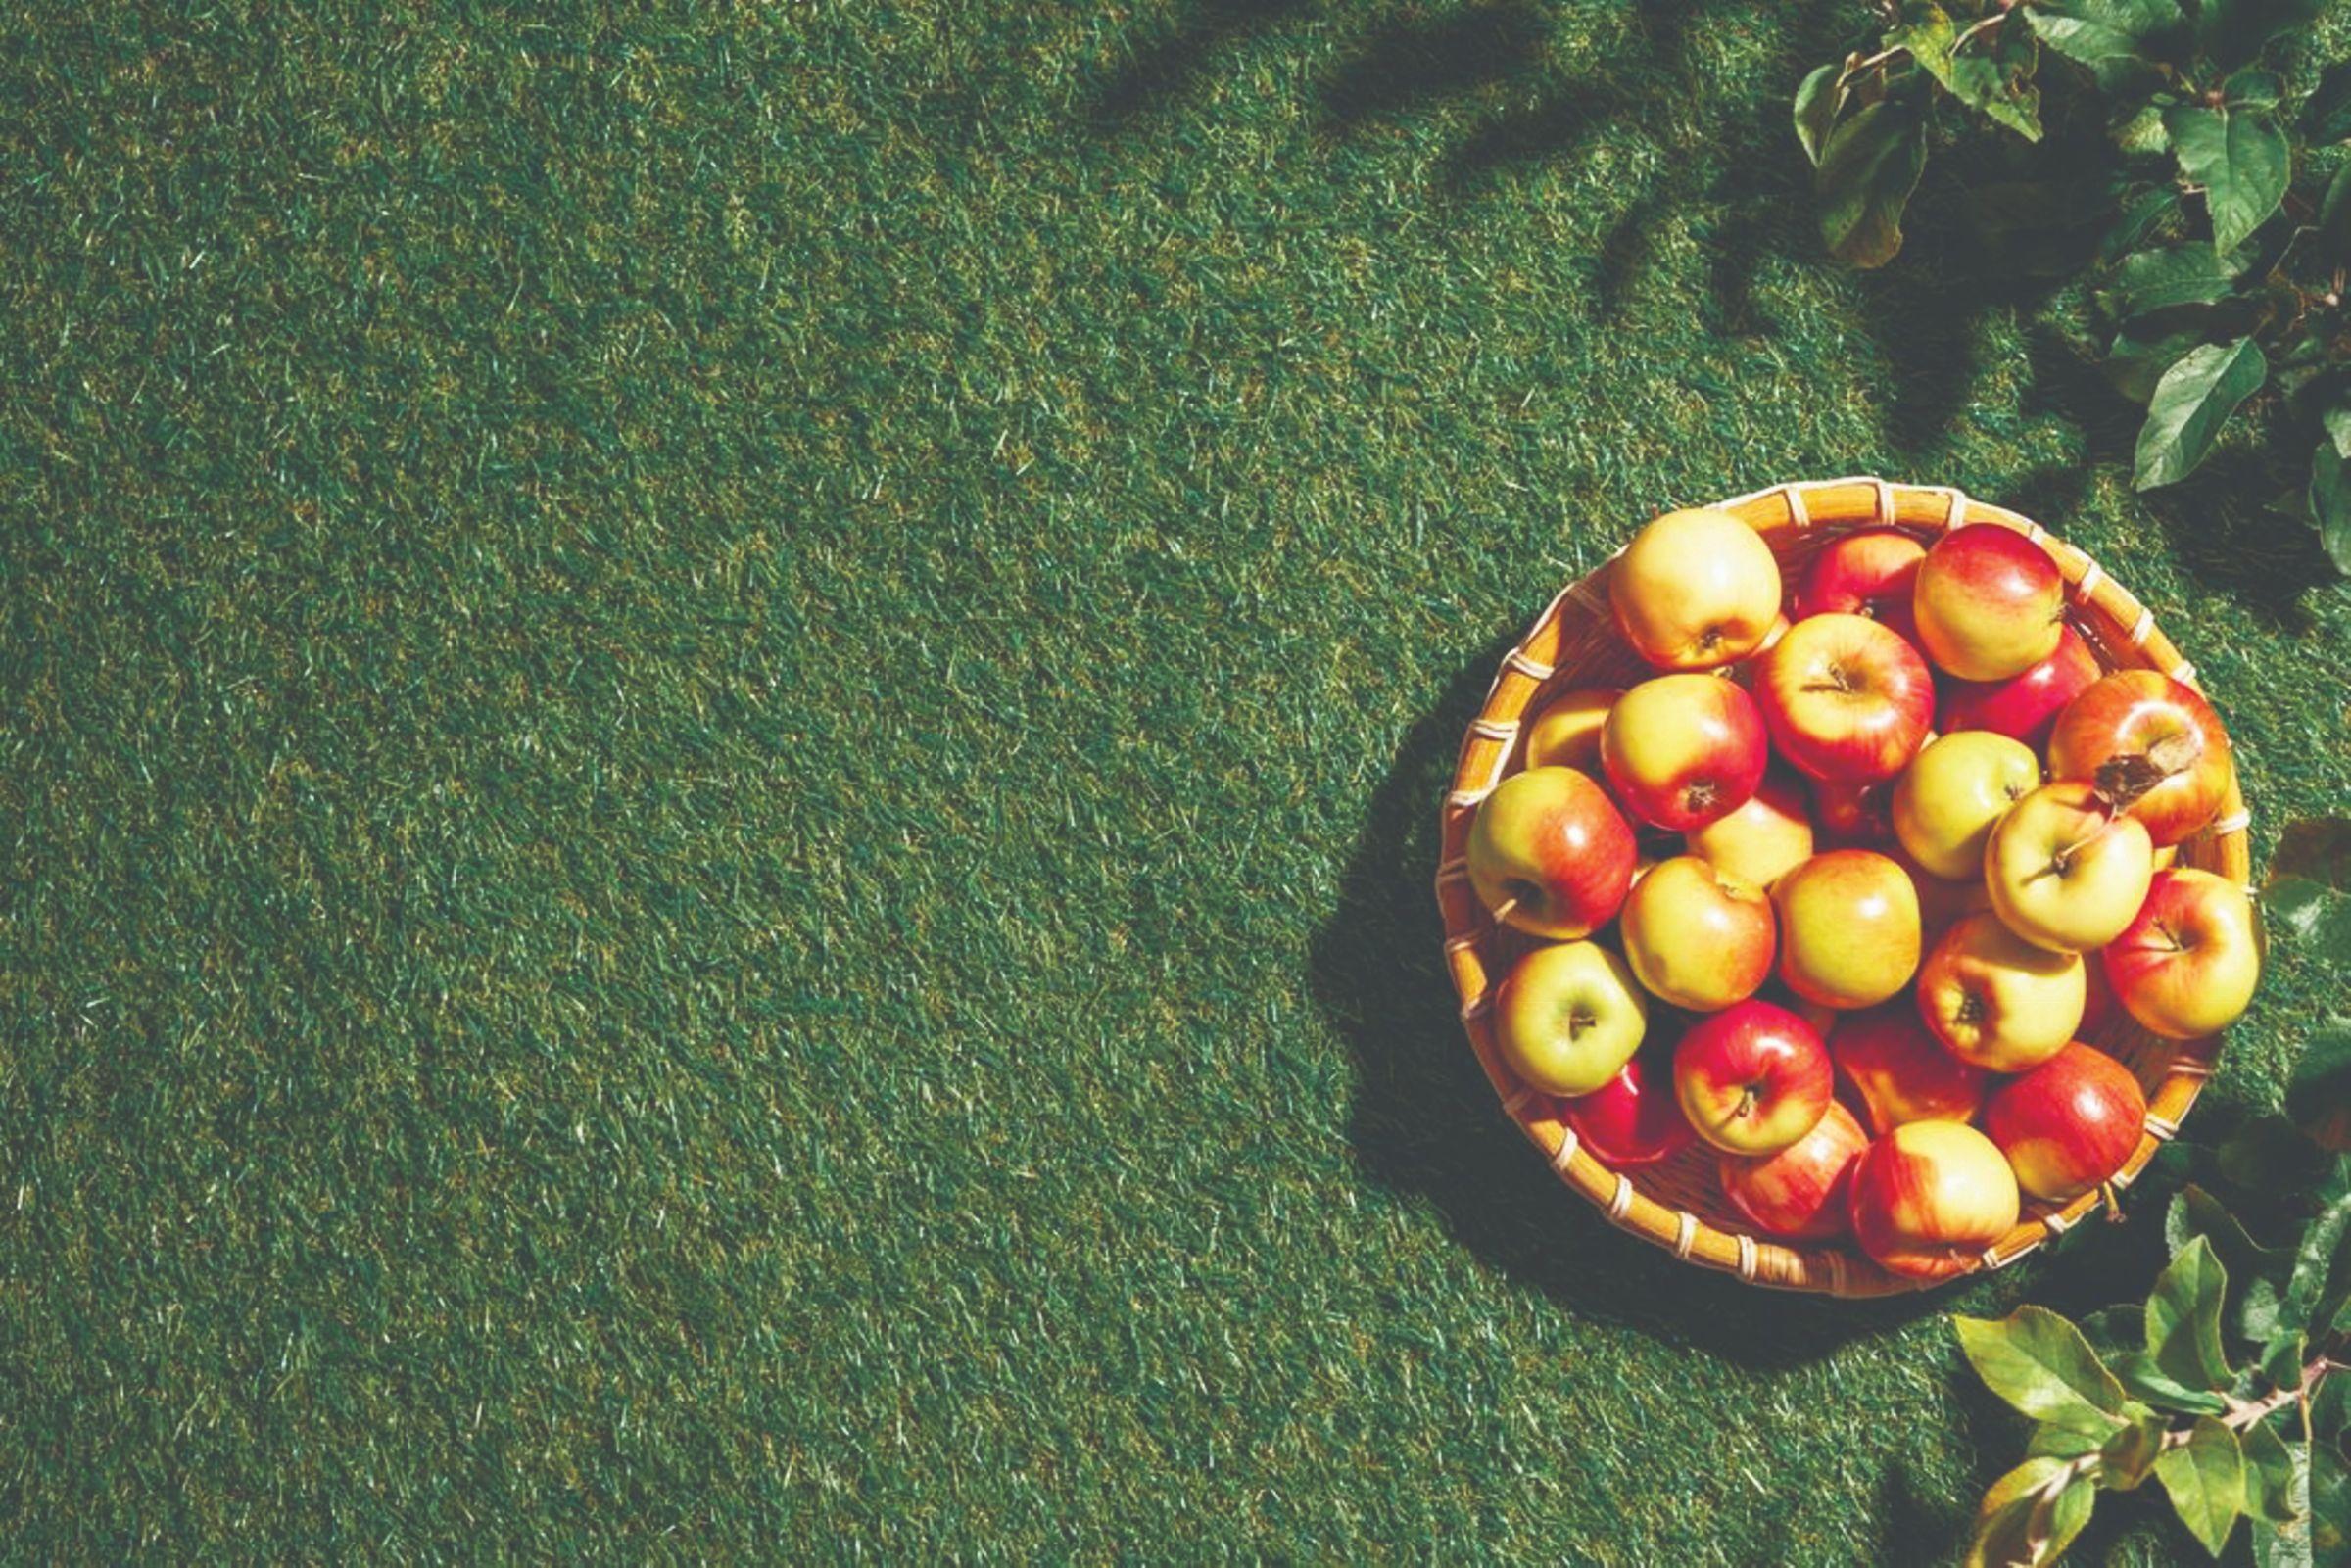 mikroelementi ishrana gnojidba